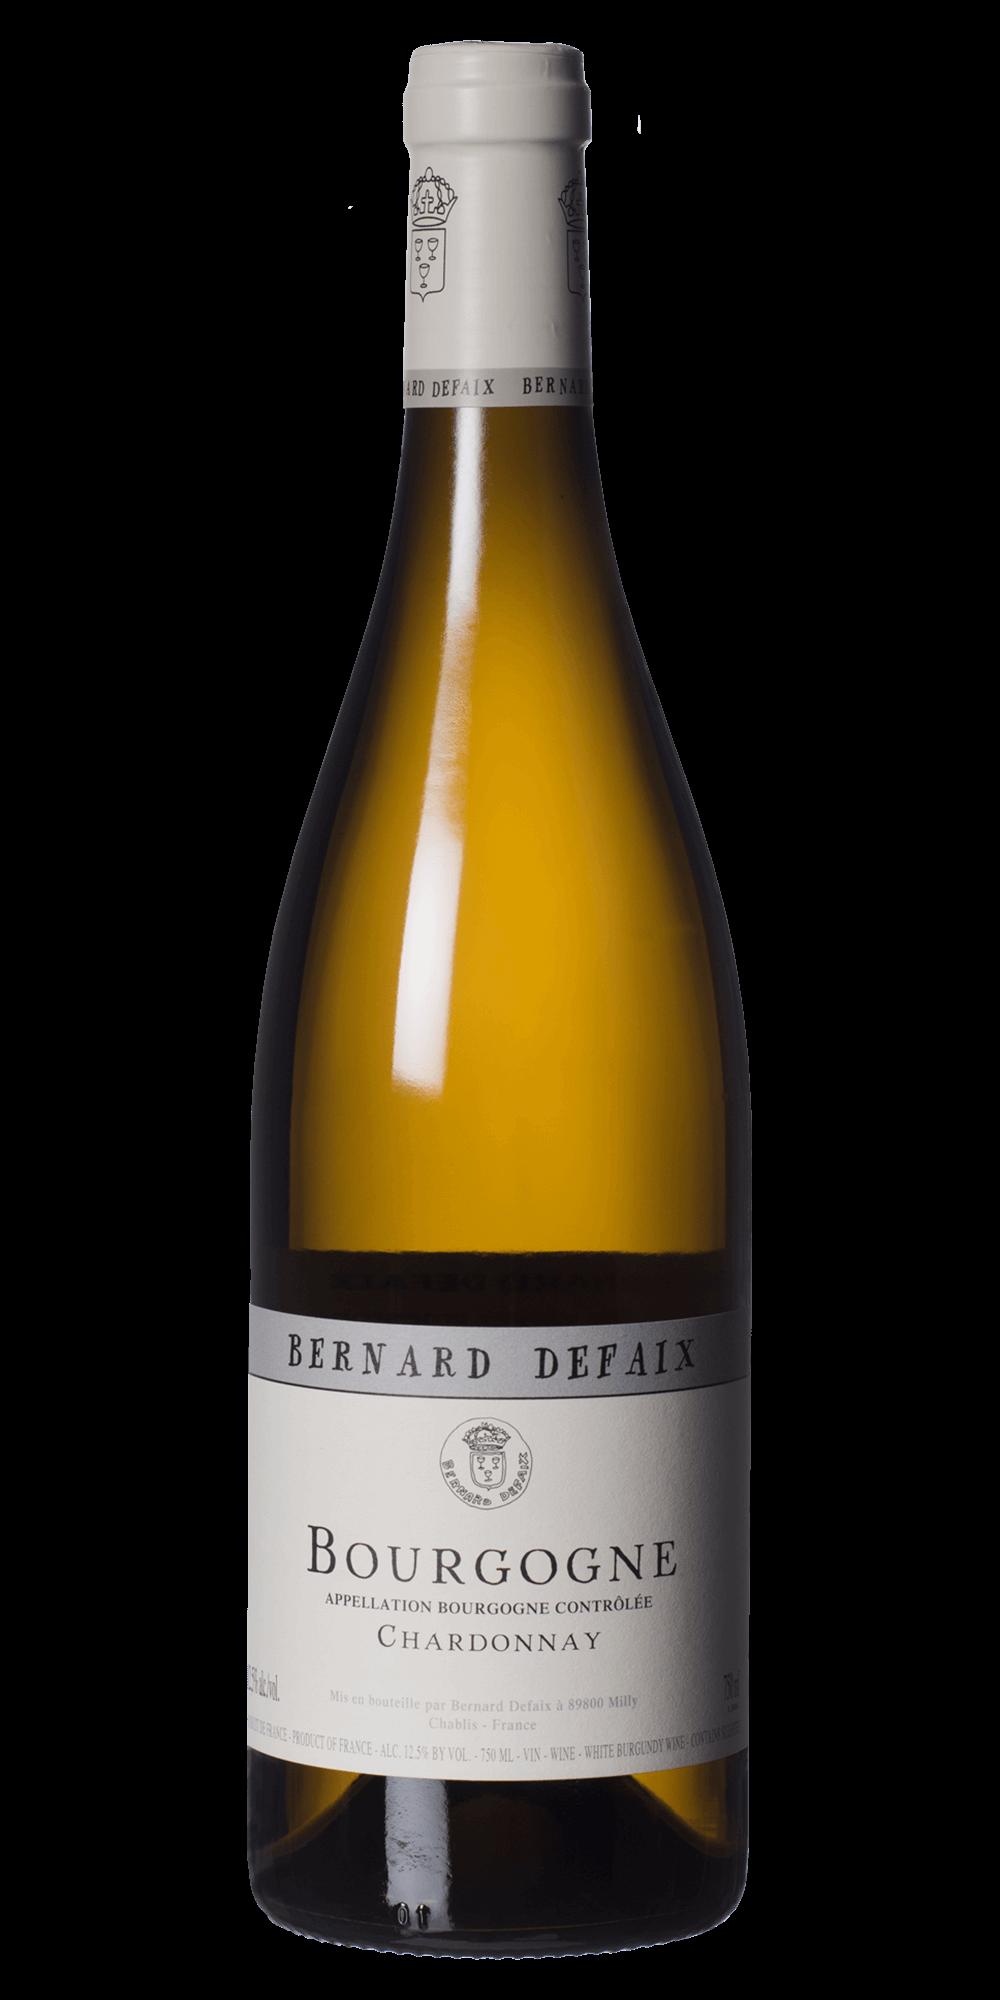 Domaine Bernard Defaix Bourgogne Chardonnay 75CL